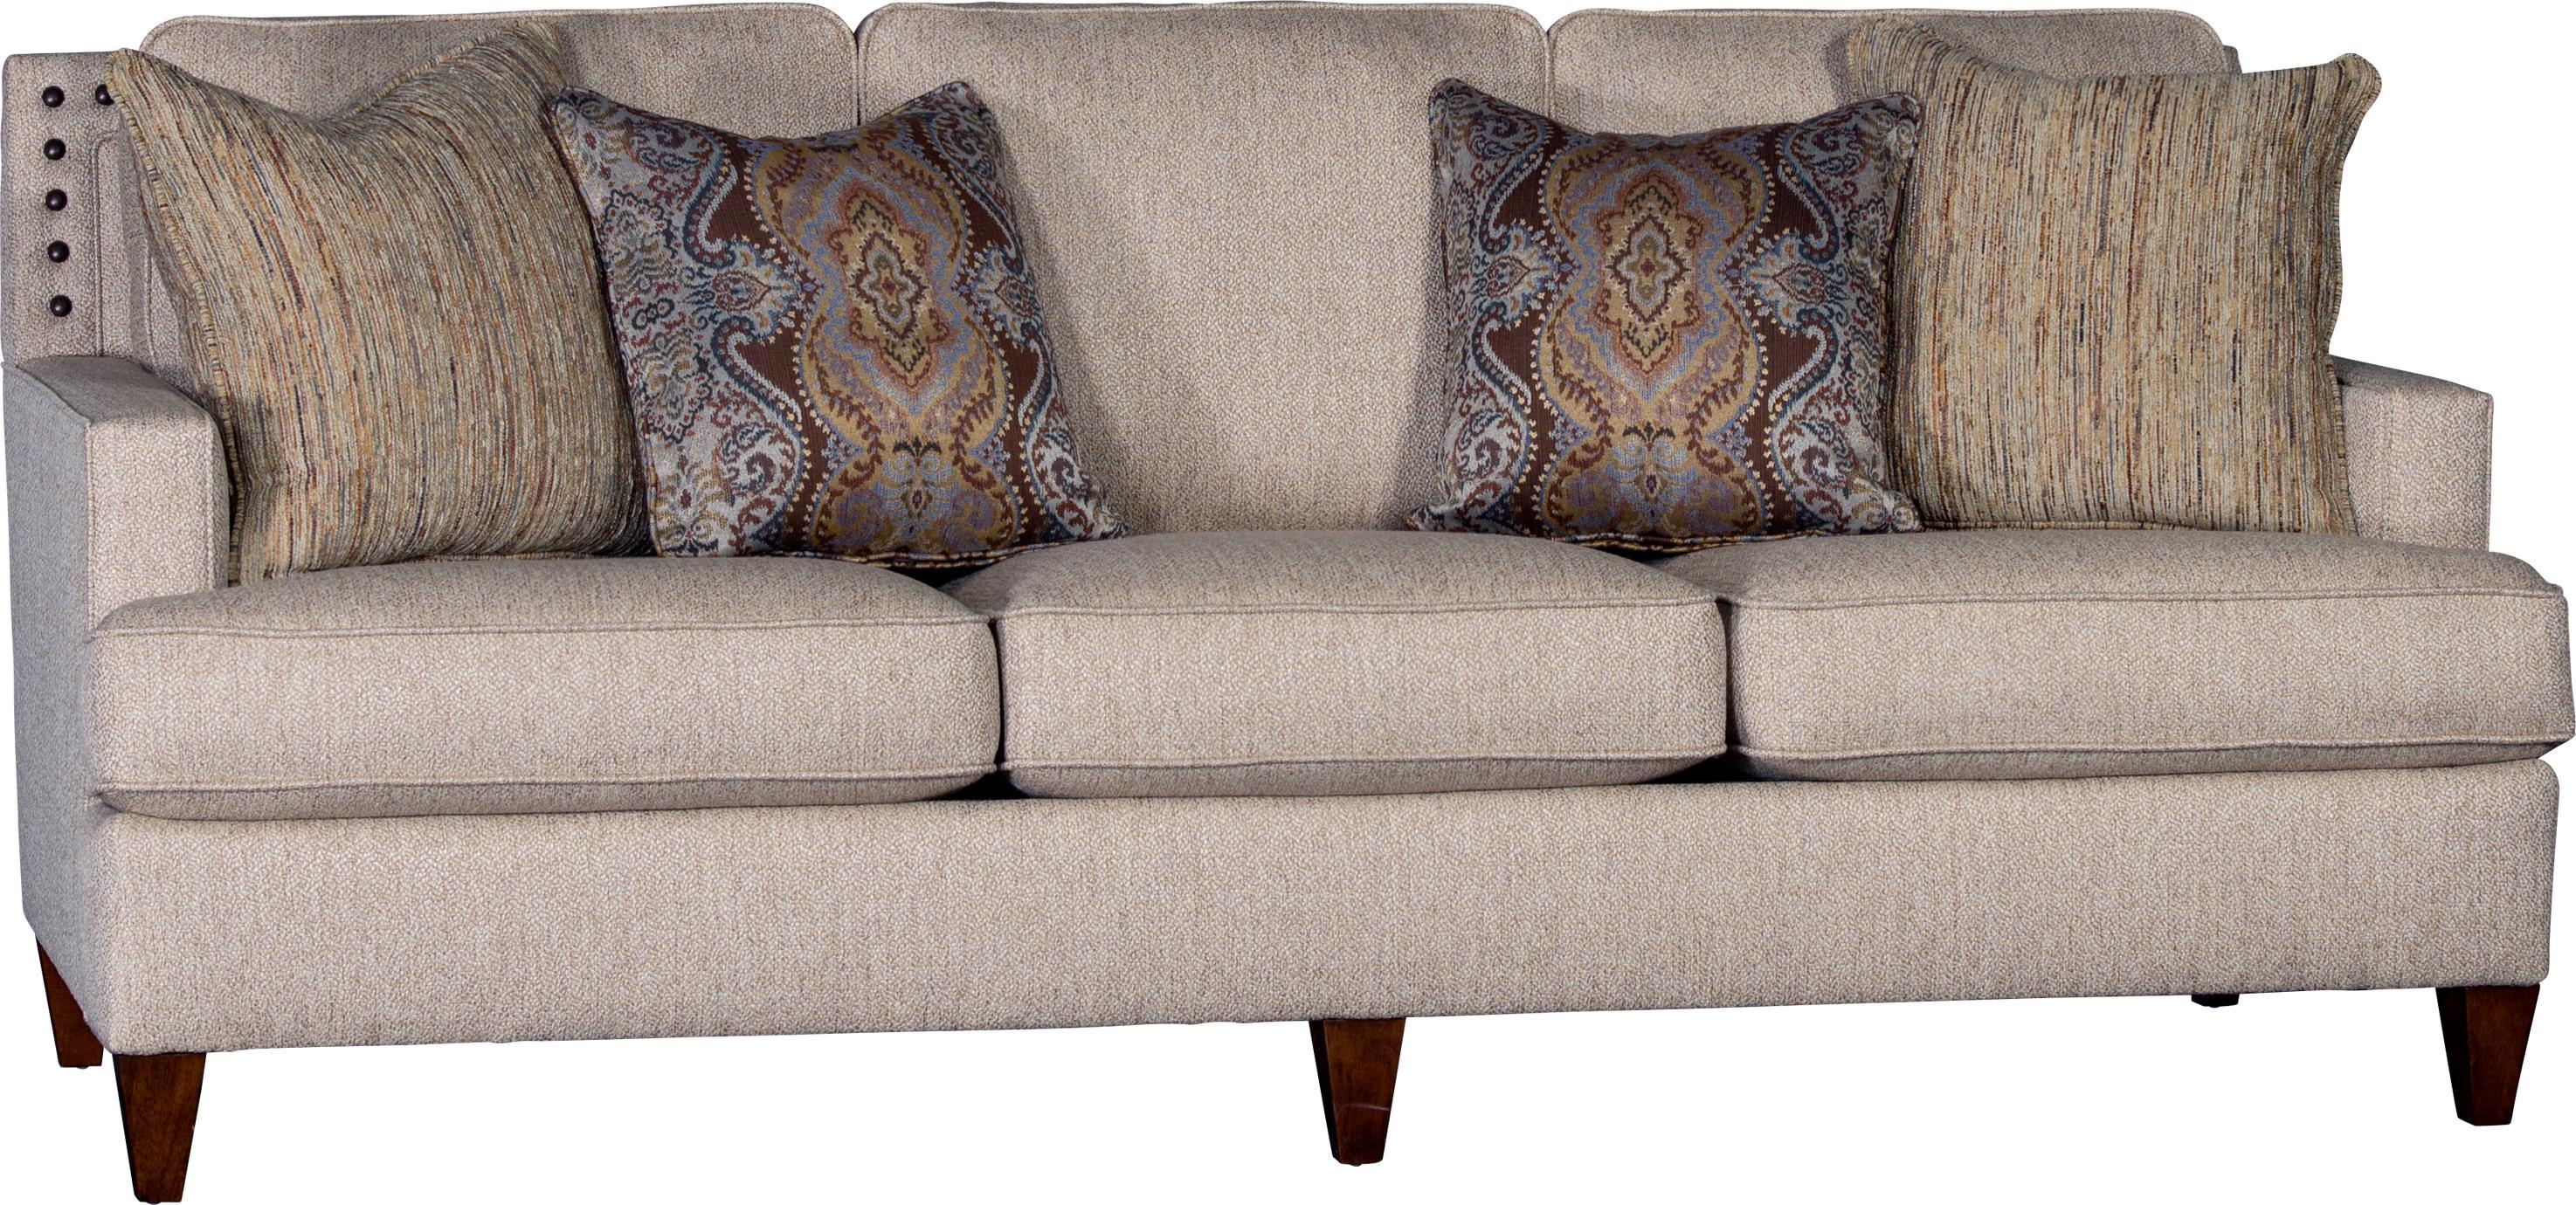 3030 Sofa by Mayo at Story & Lee Furniture